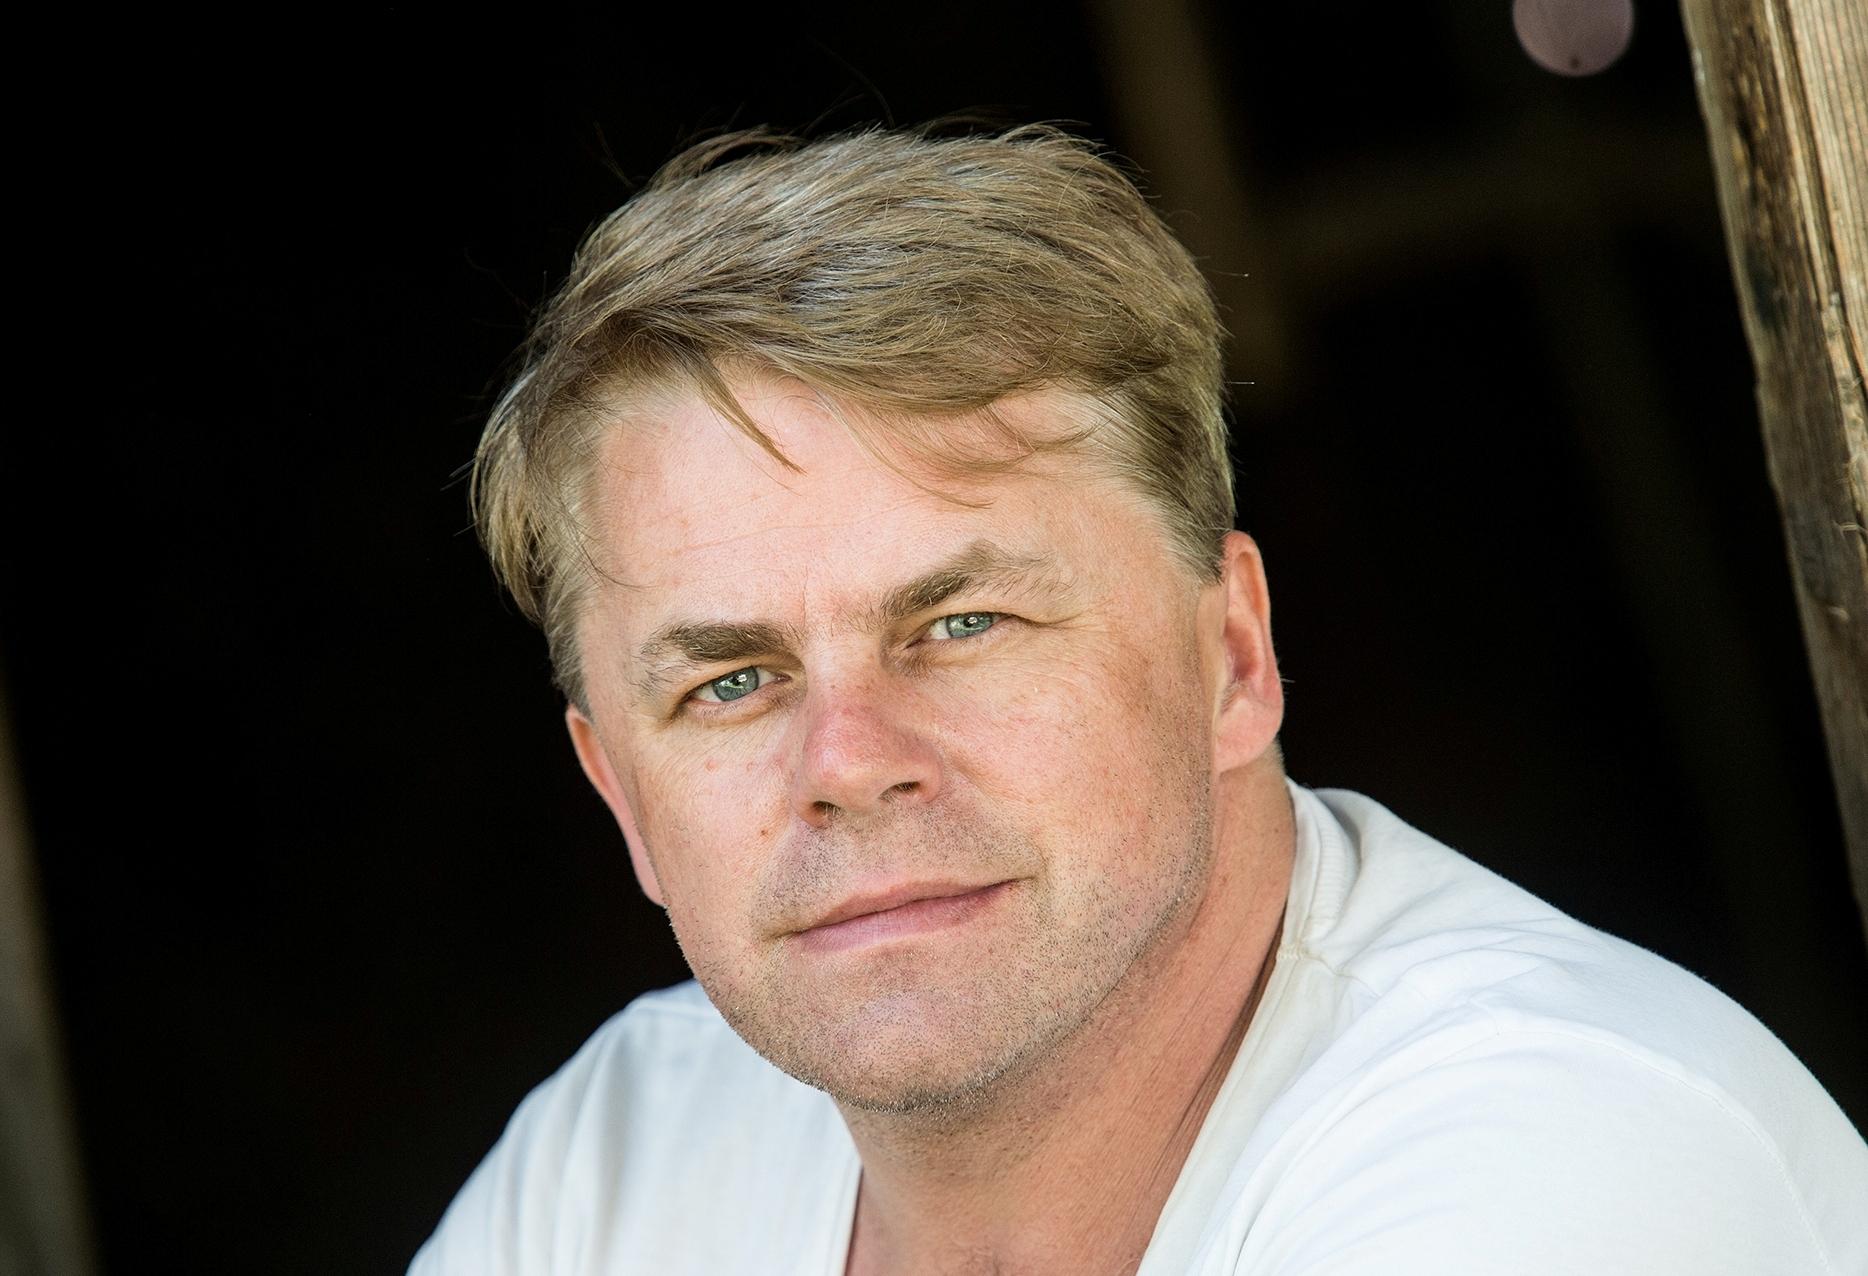 Peter Truschner, fot. Stefan Schweiger (źródło: materiały prasowe organizatora)